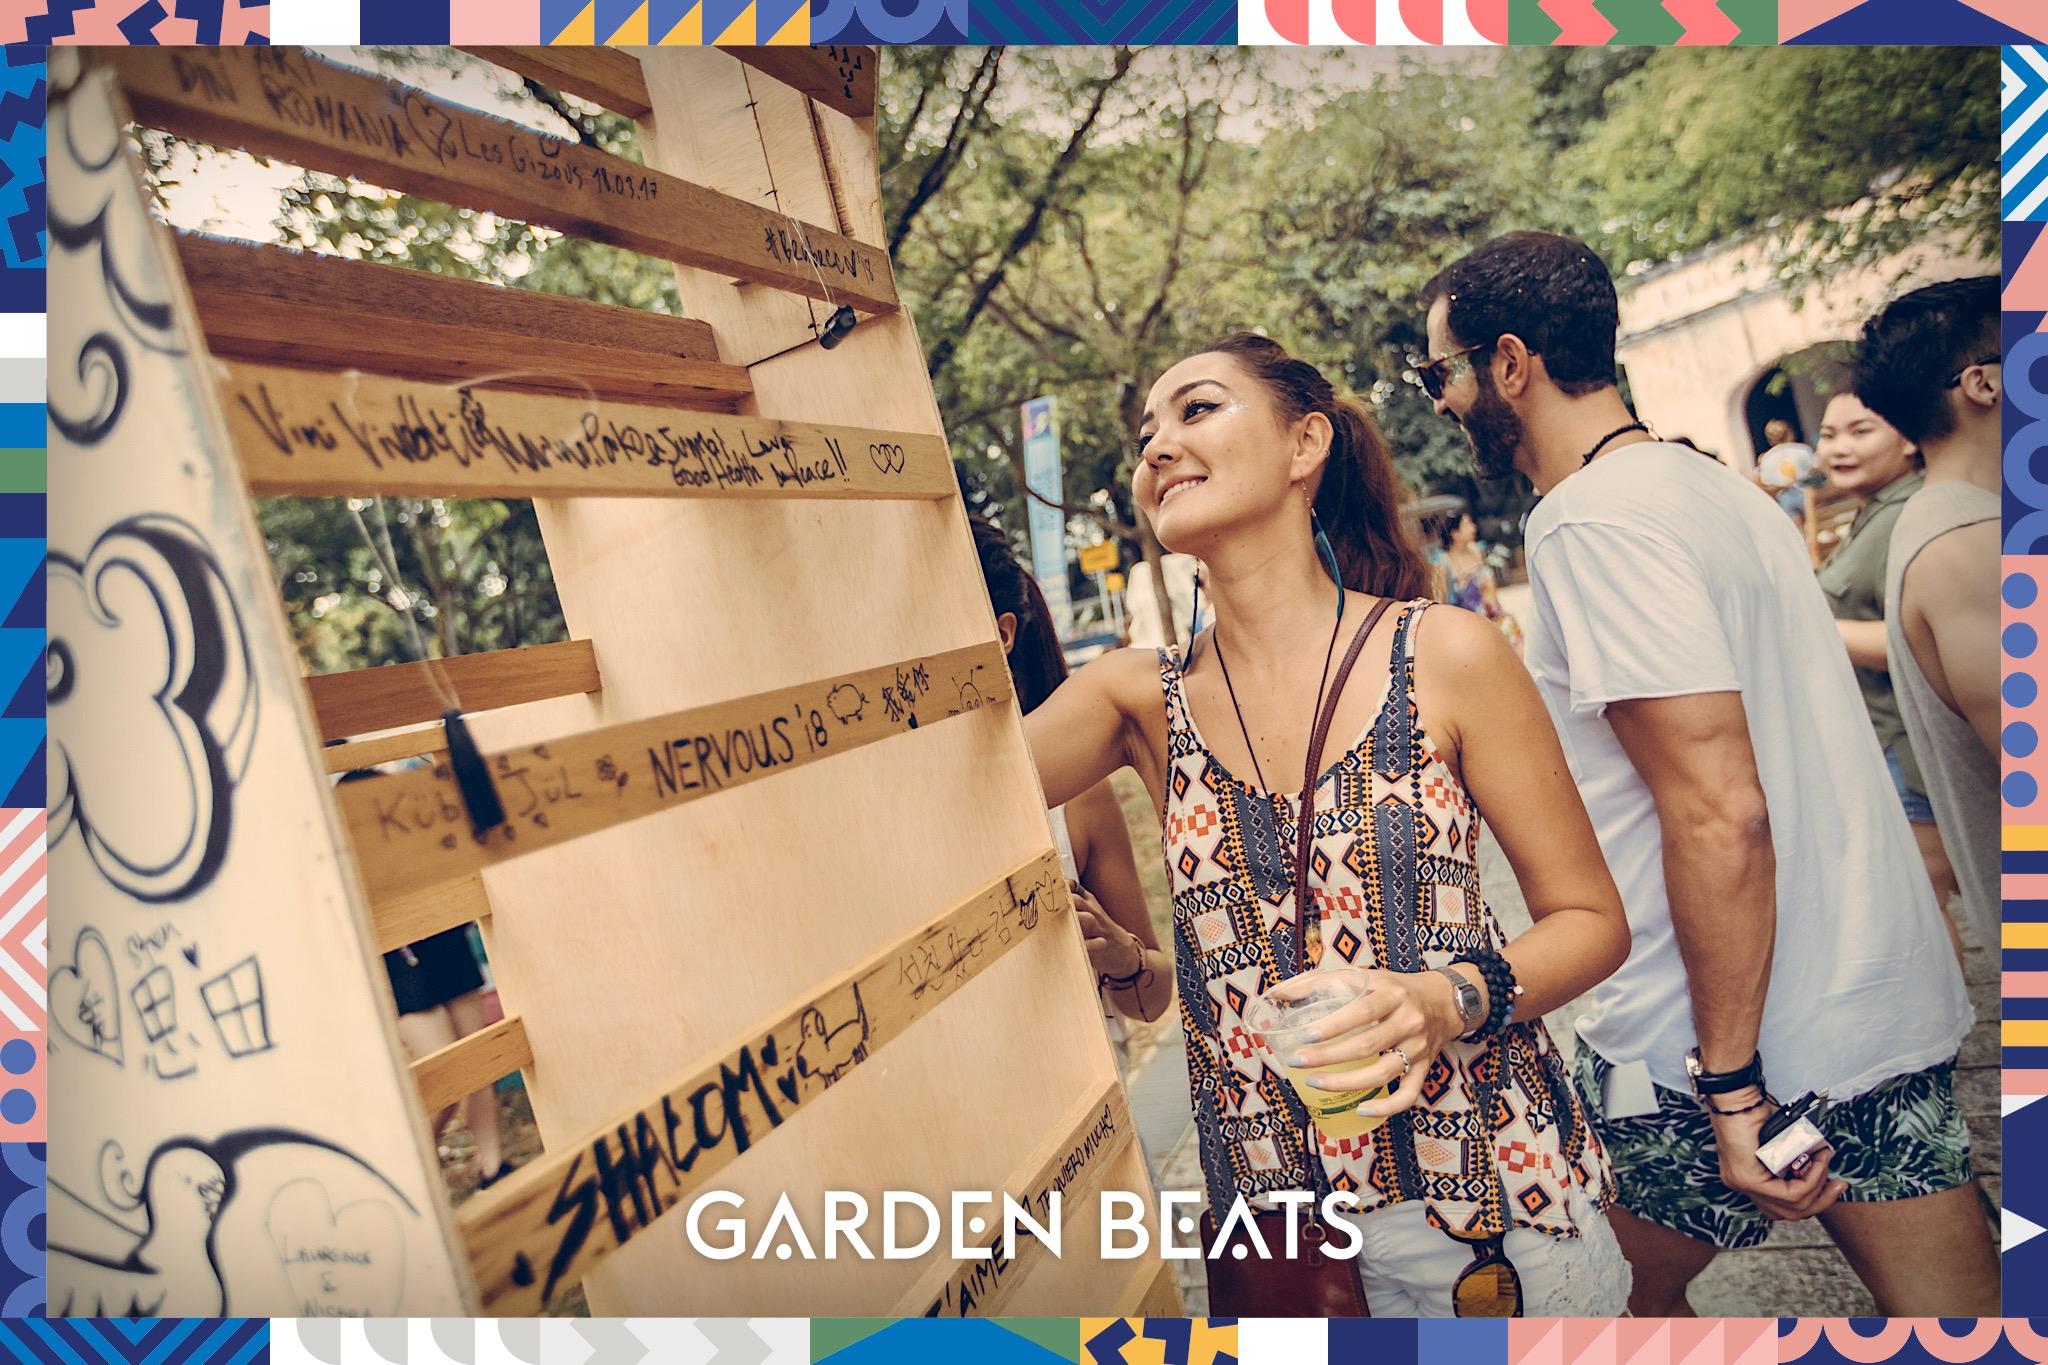 03032018_GardenBeats_Colossal400_Watermarked.jpg